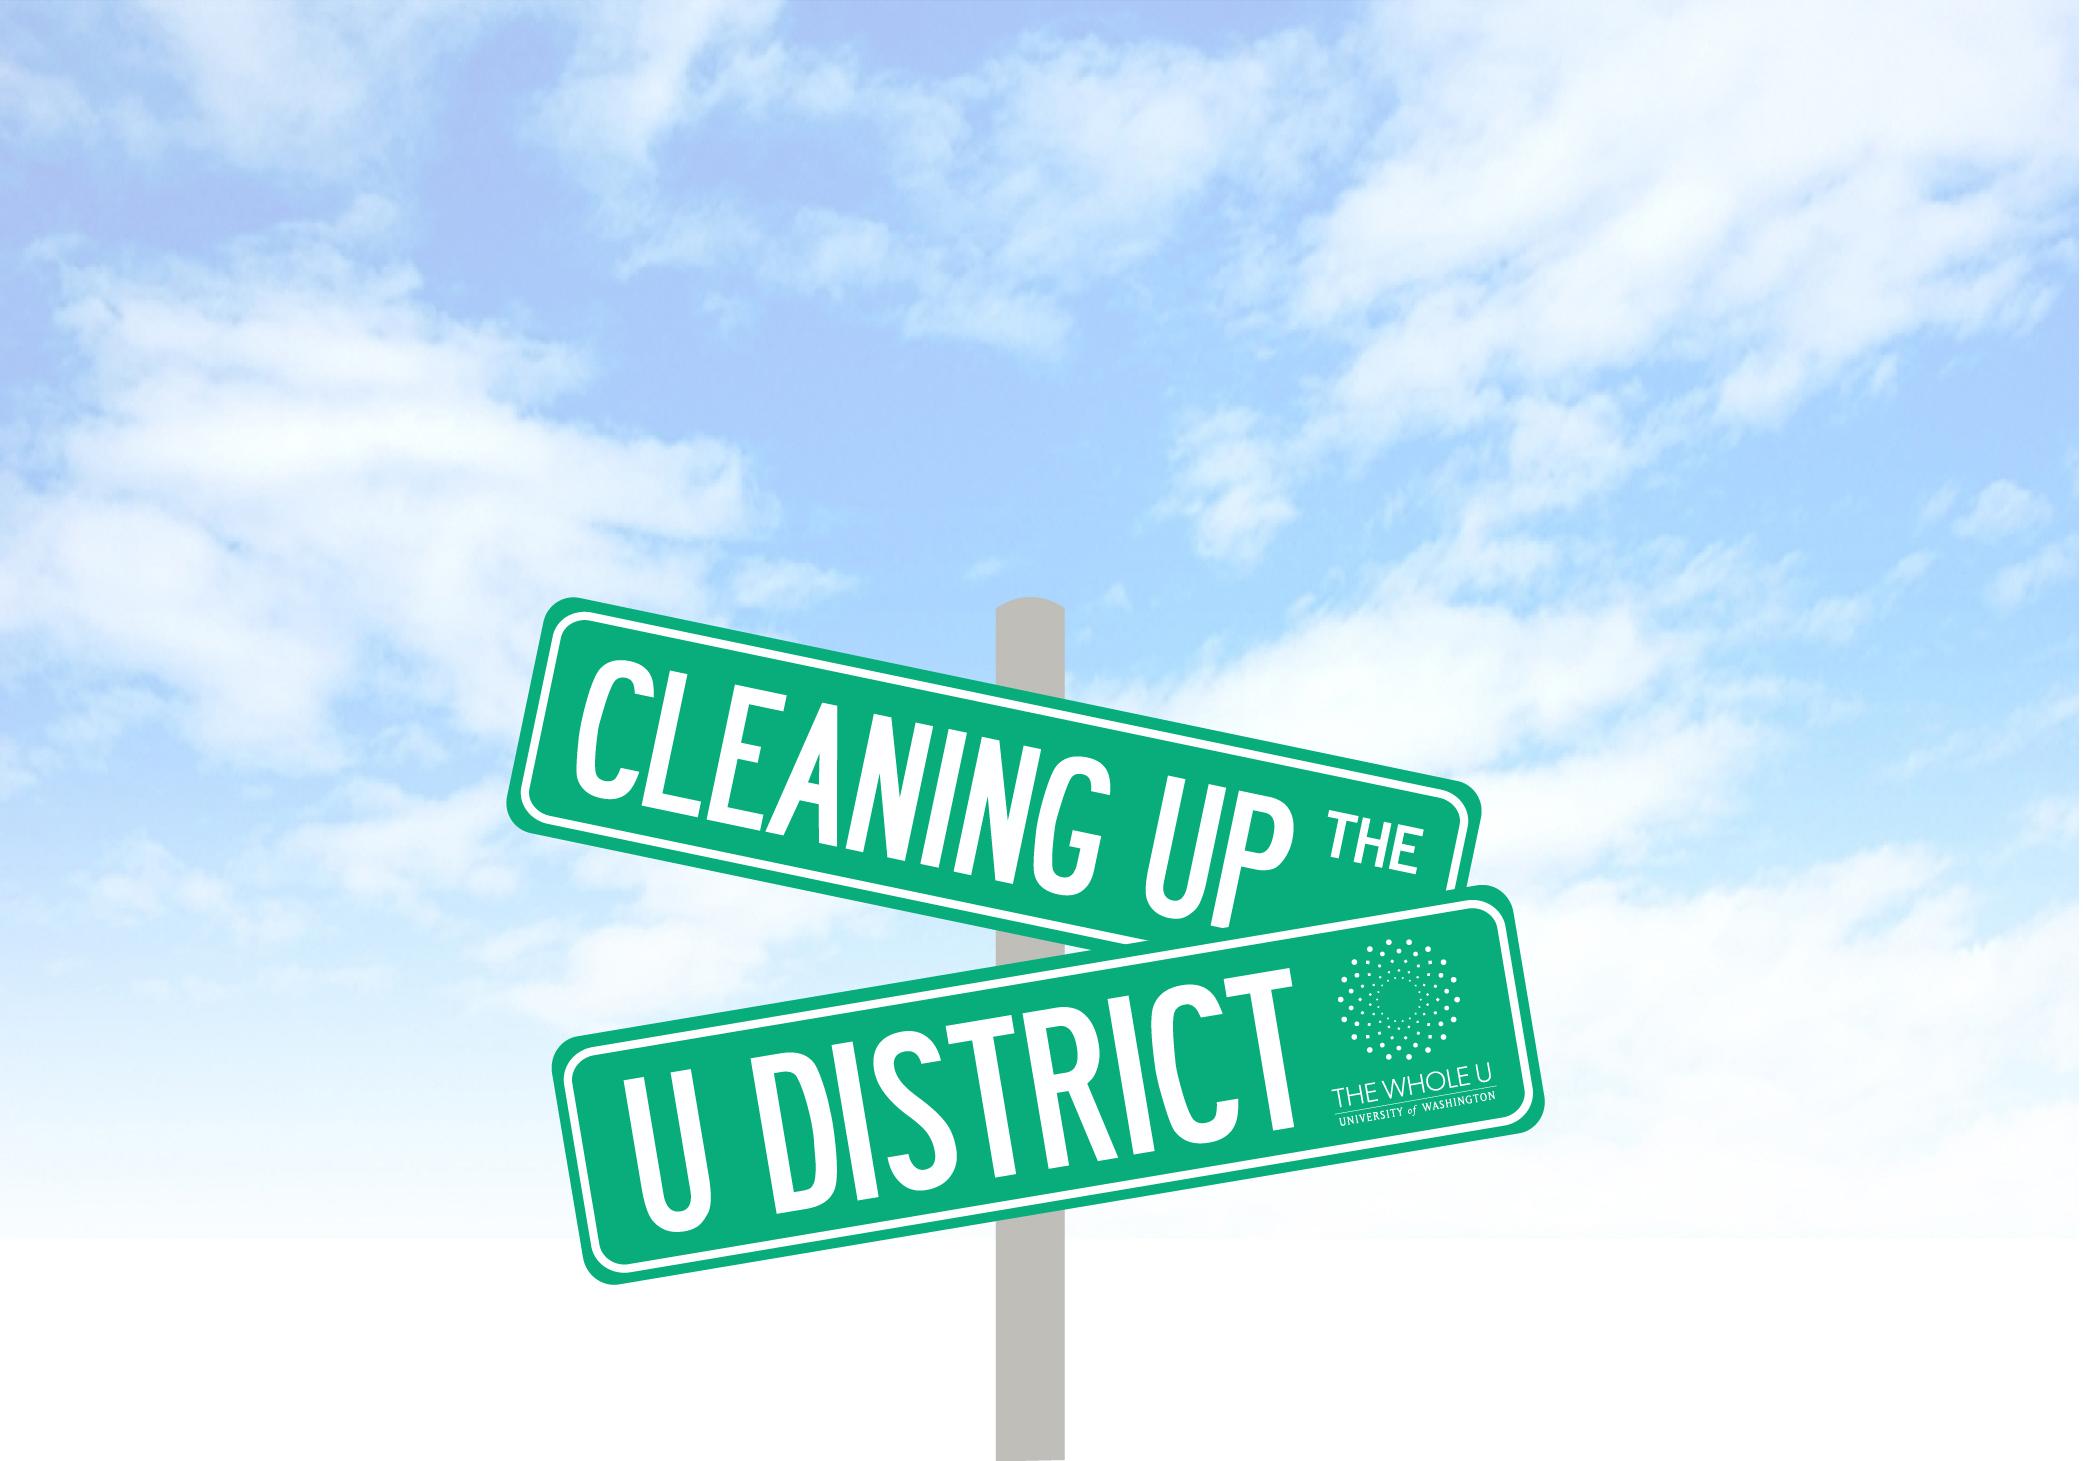 U district clean up